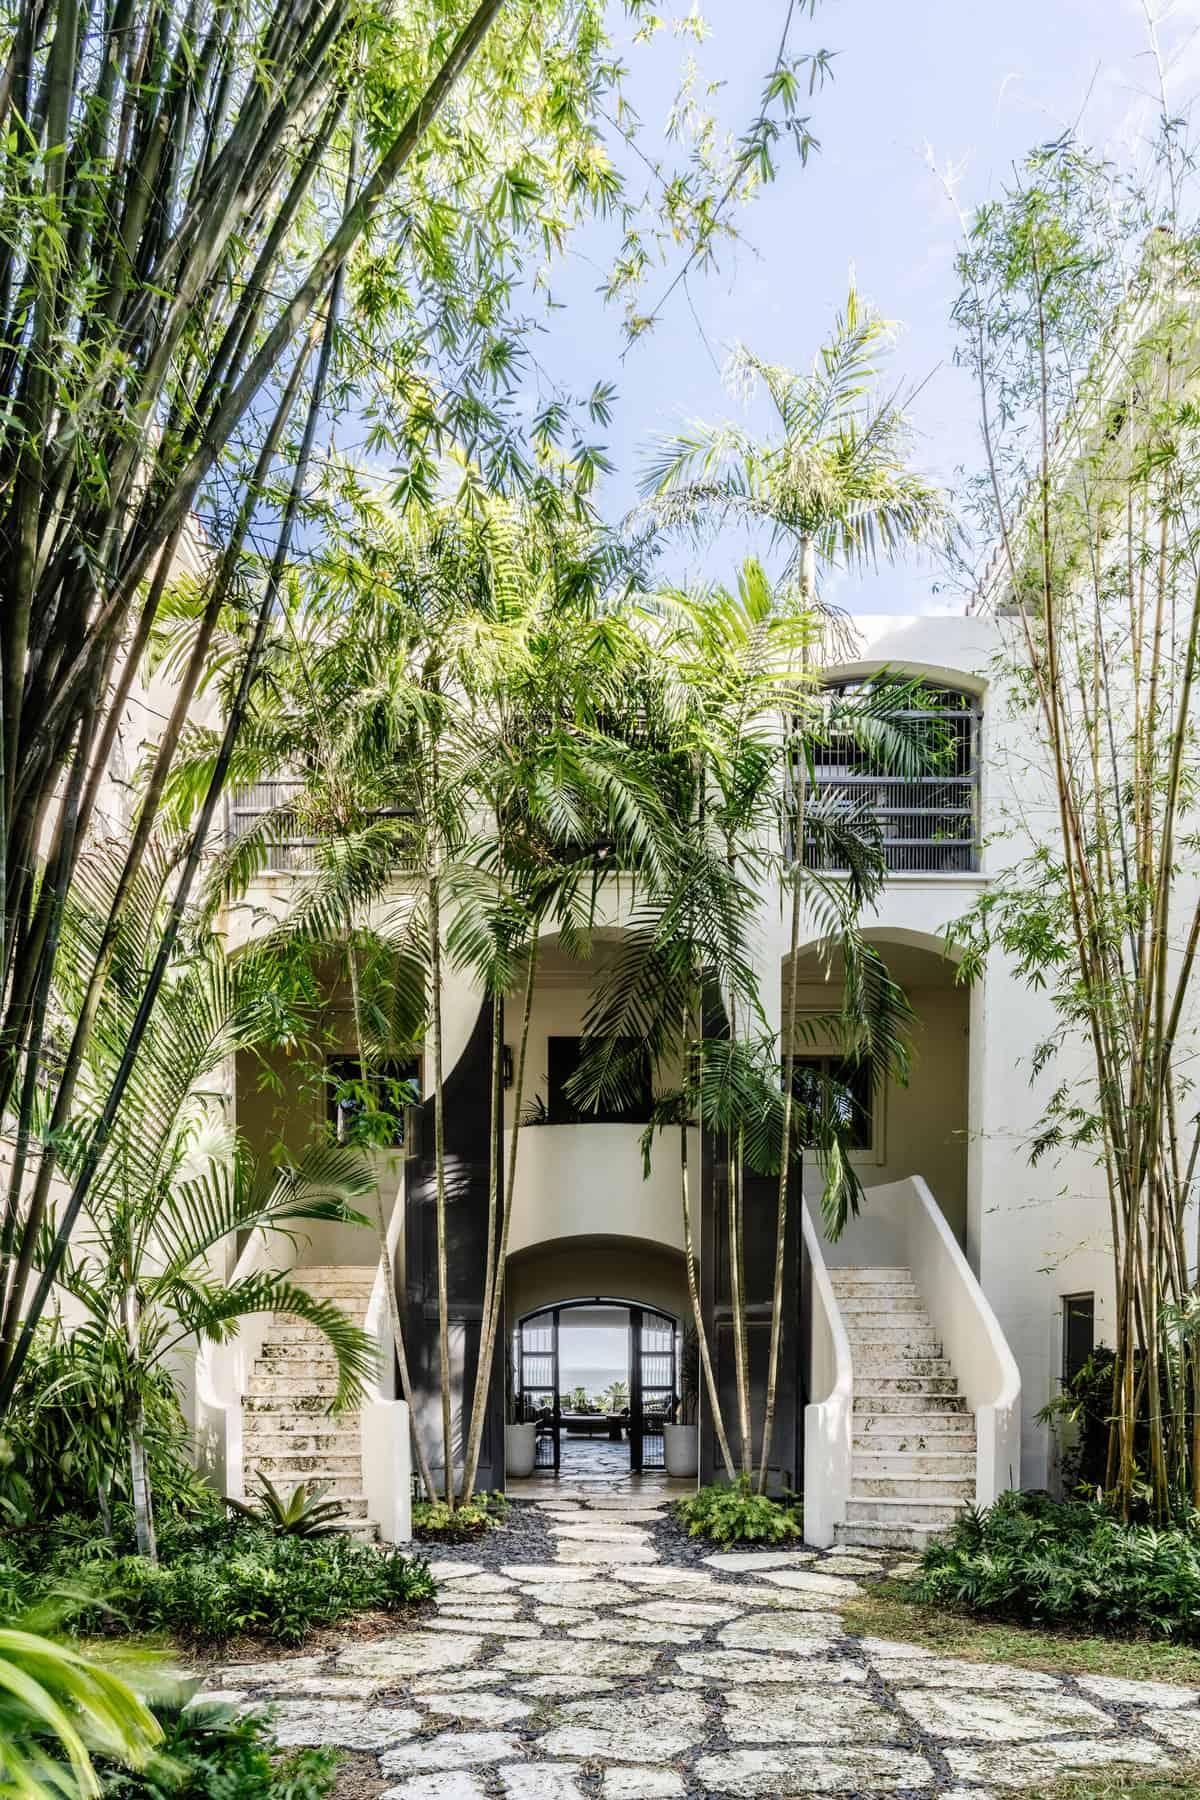 hacienda-spanish-style-house-exterior